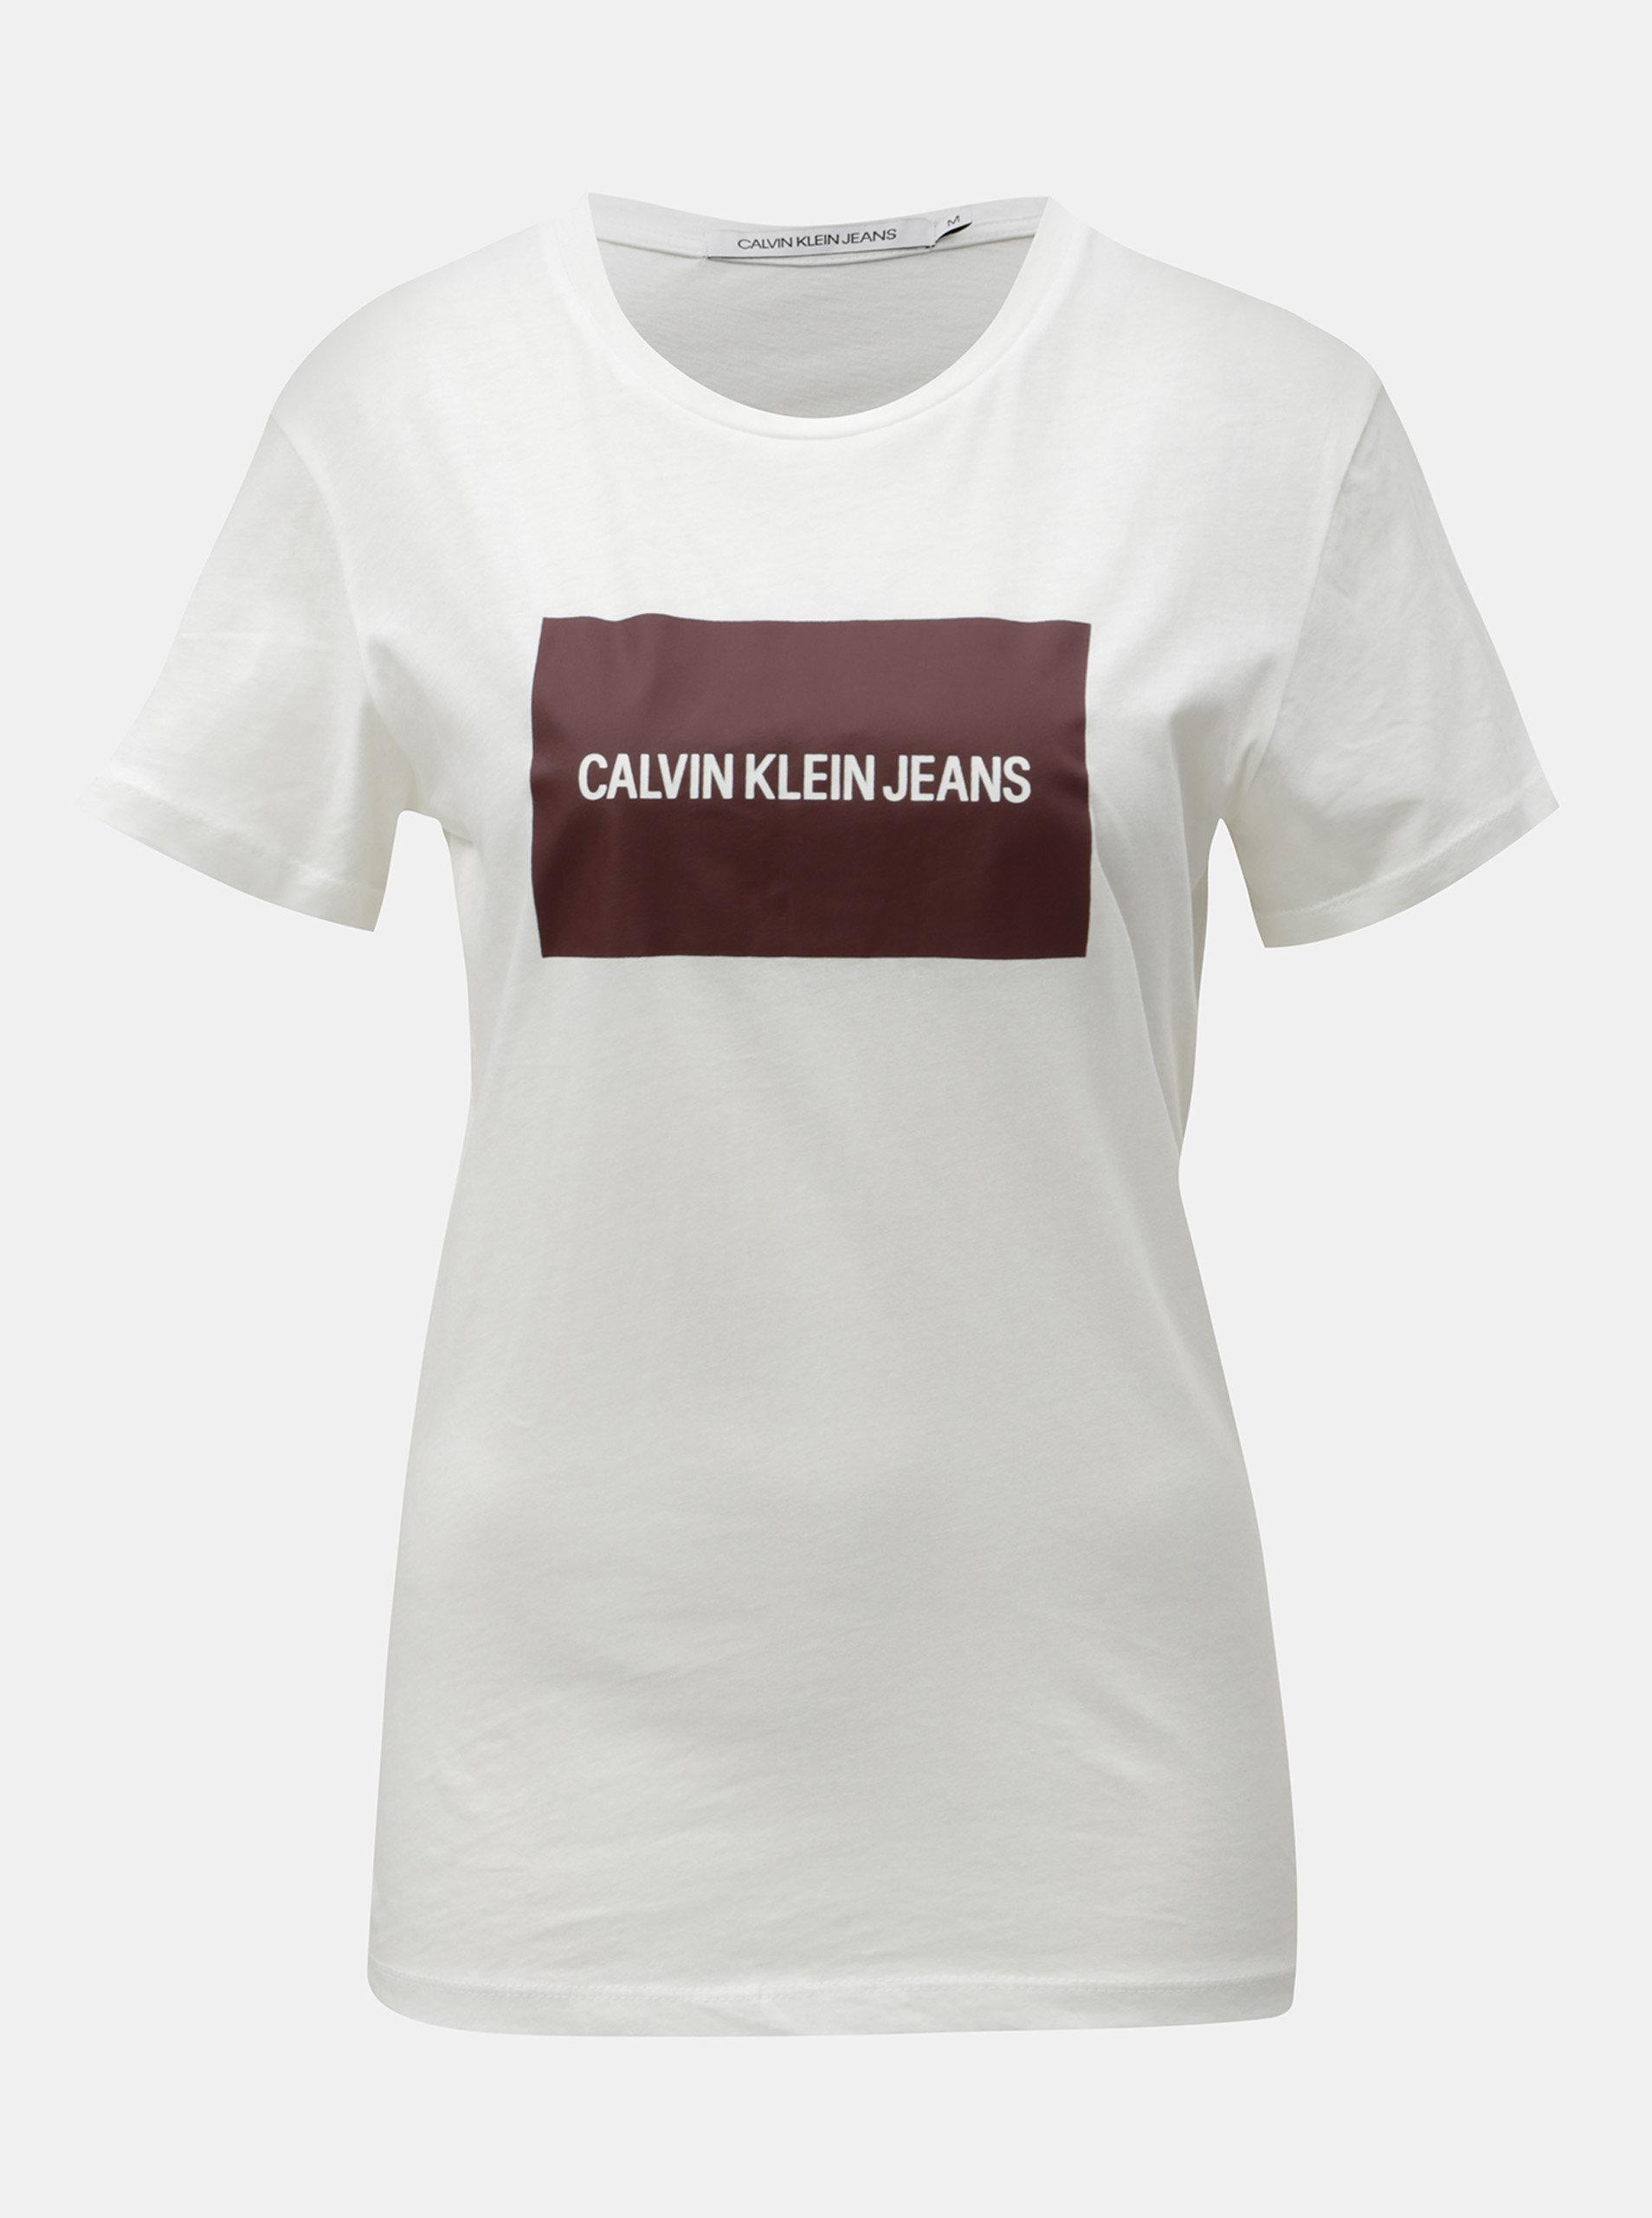 Bílé dámské tričko s potiskem Calvin Klein Jeans ... 80b681df8ba